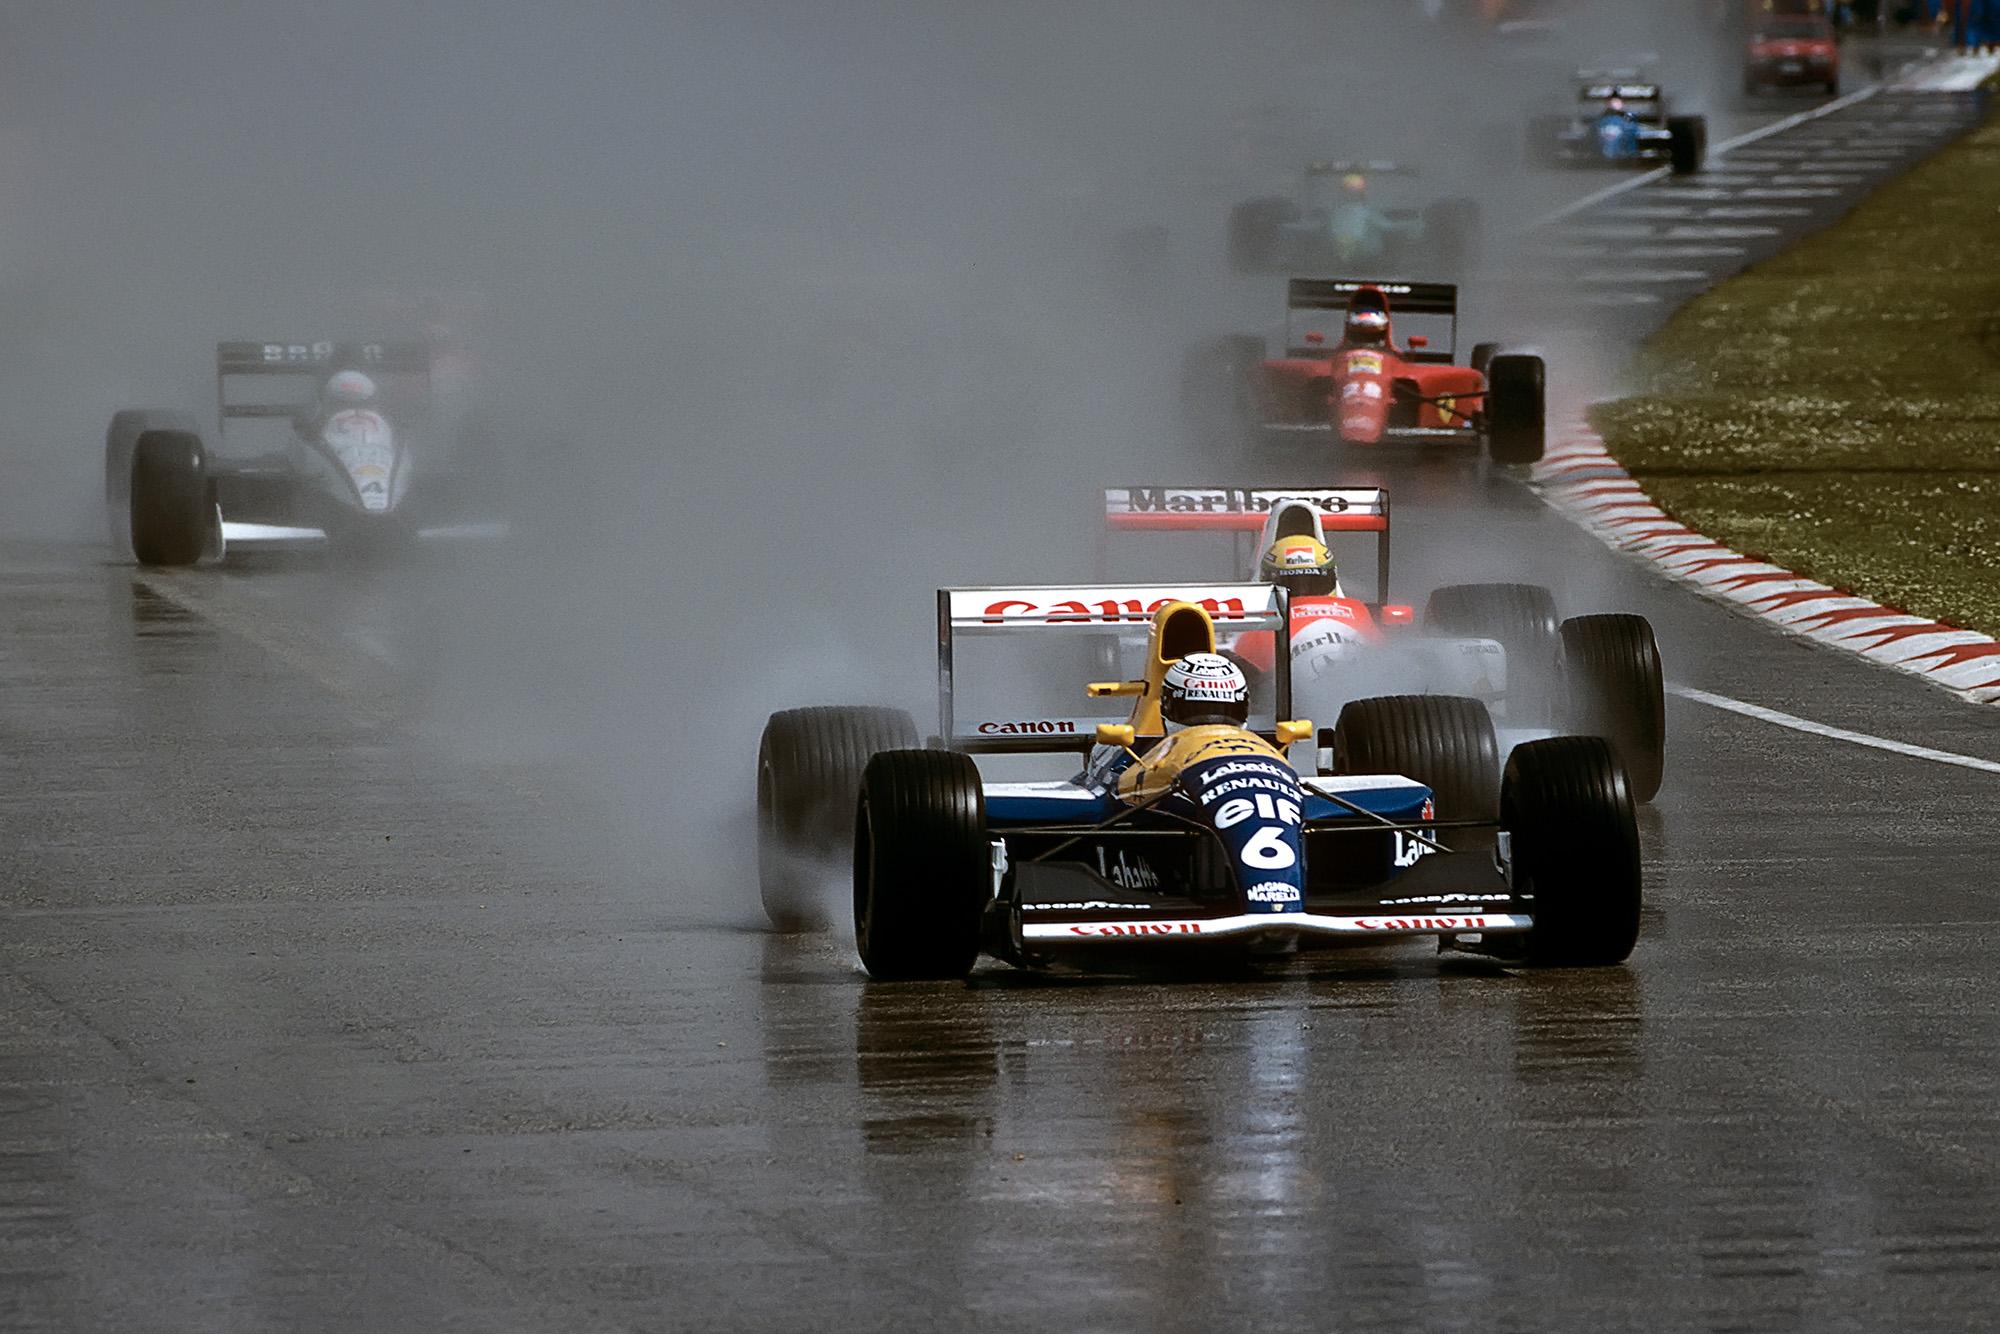 Riccardo Patrese leads at the start of the 1991 F1 San Marino Grand Prix at Imola